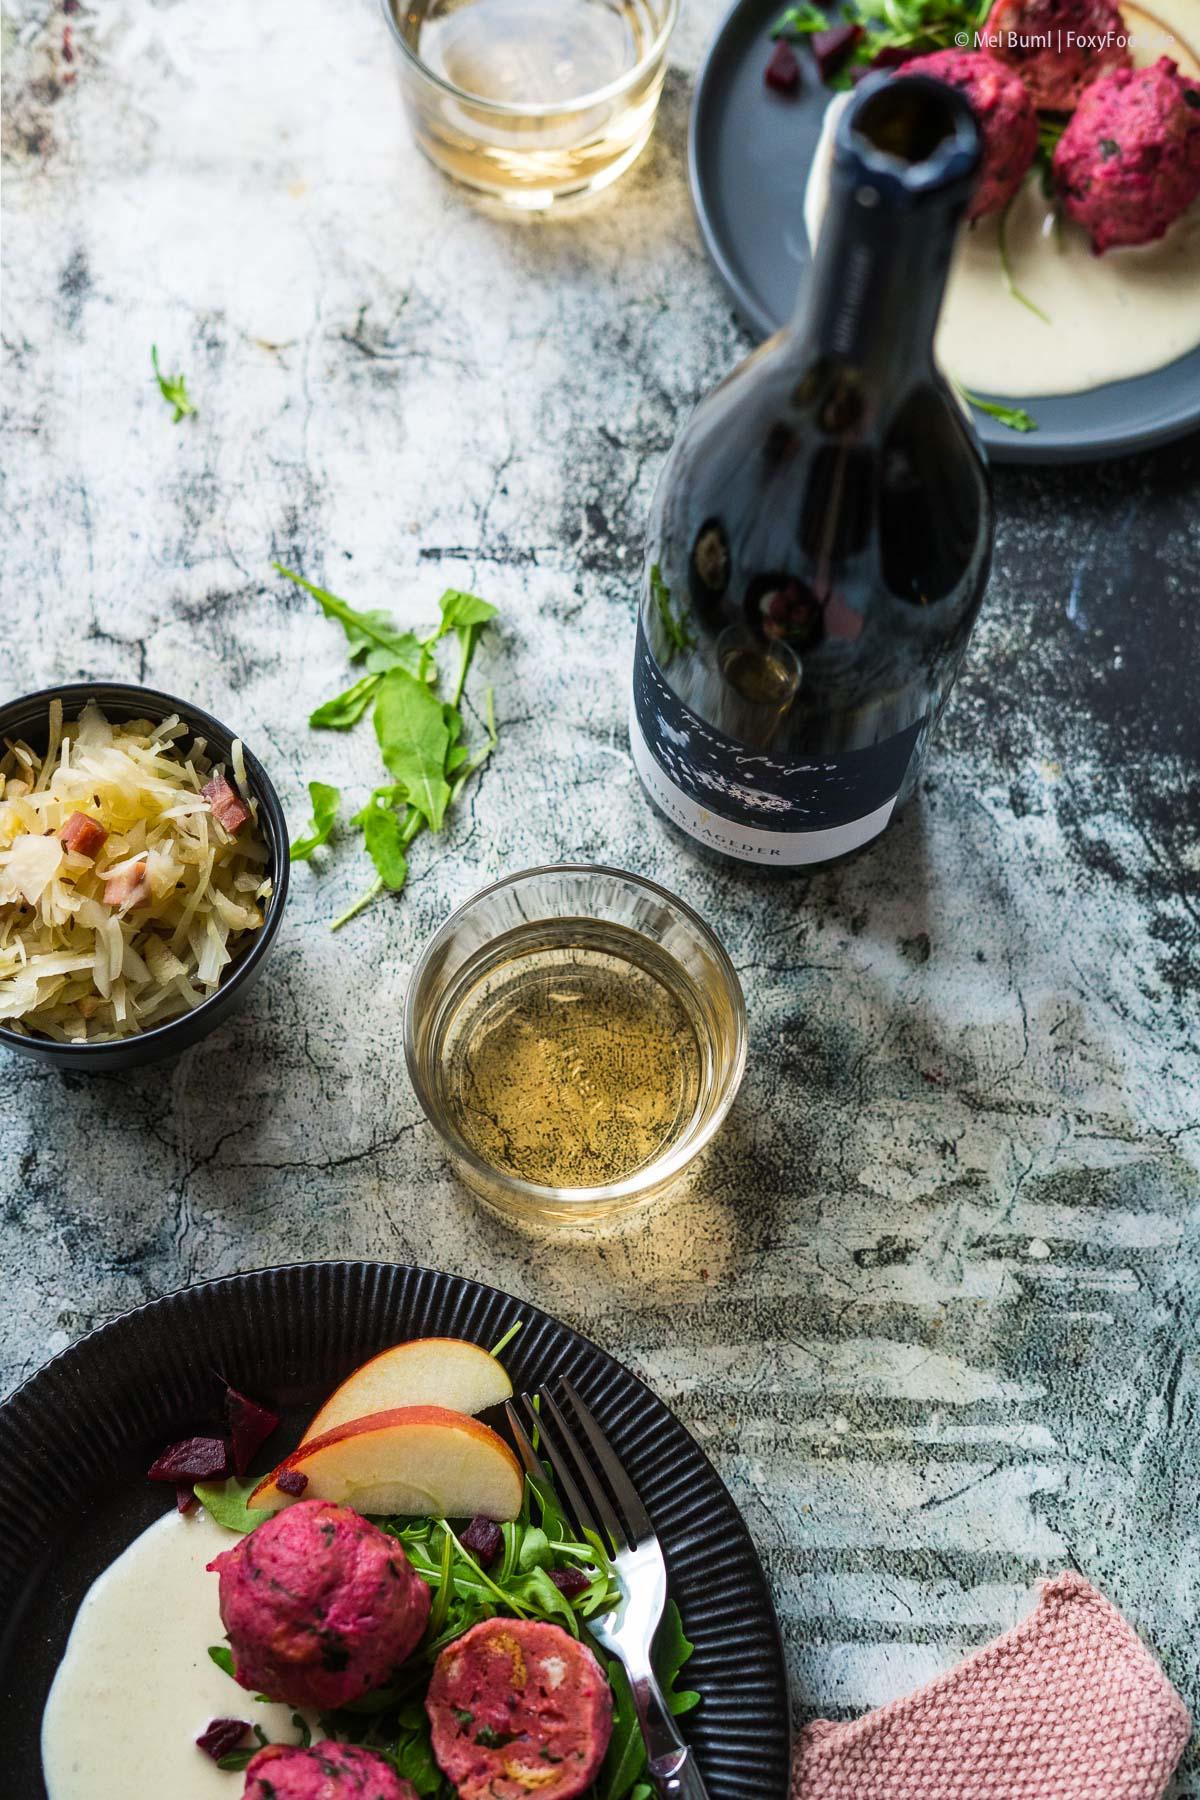 Pinot Grigio Alois Lagerer Wein Südtirol |FoxyFood.de